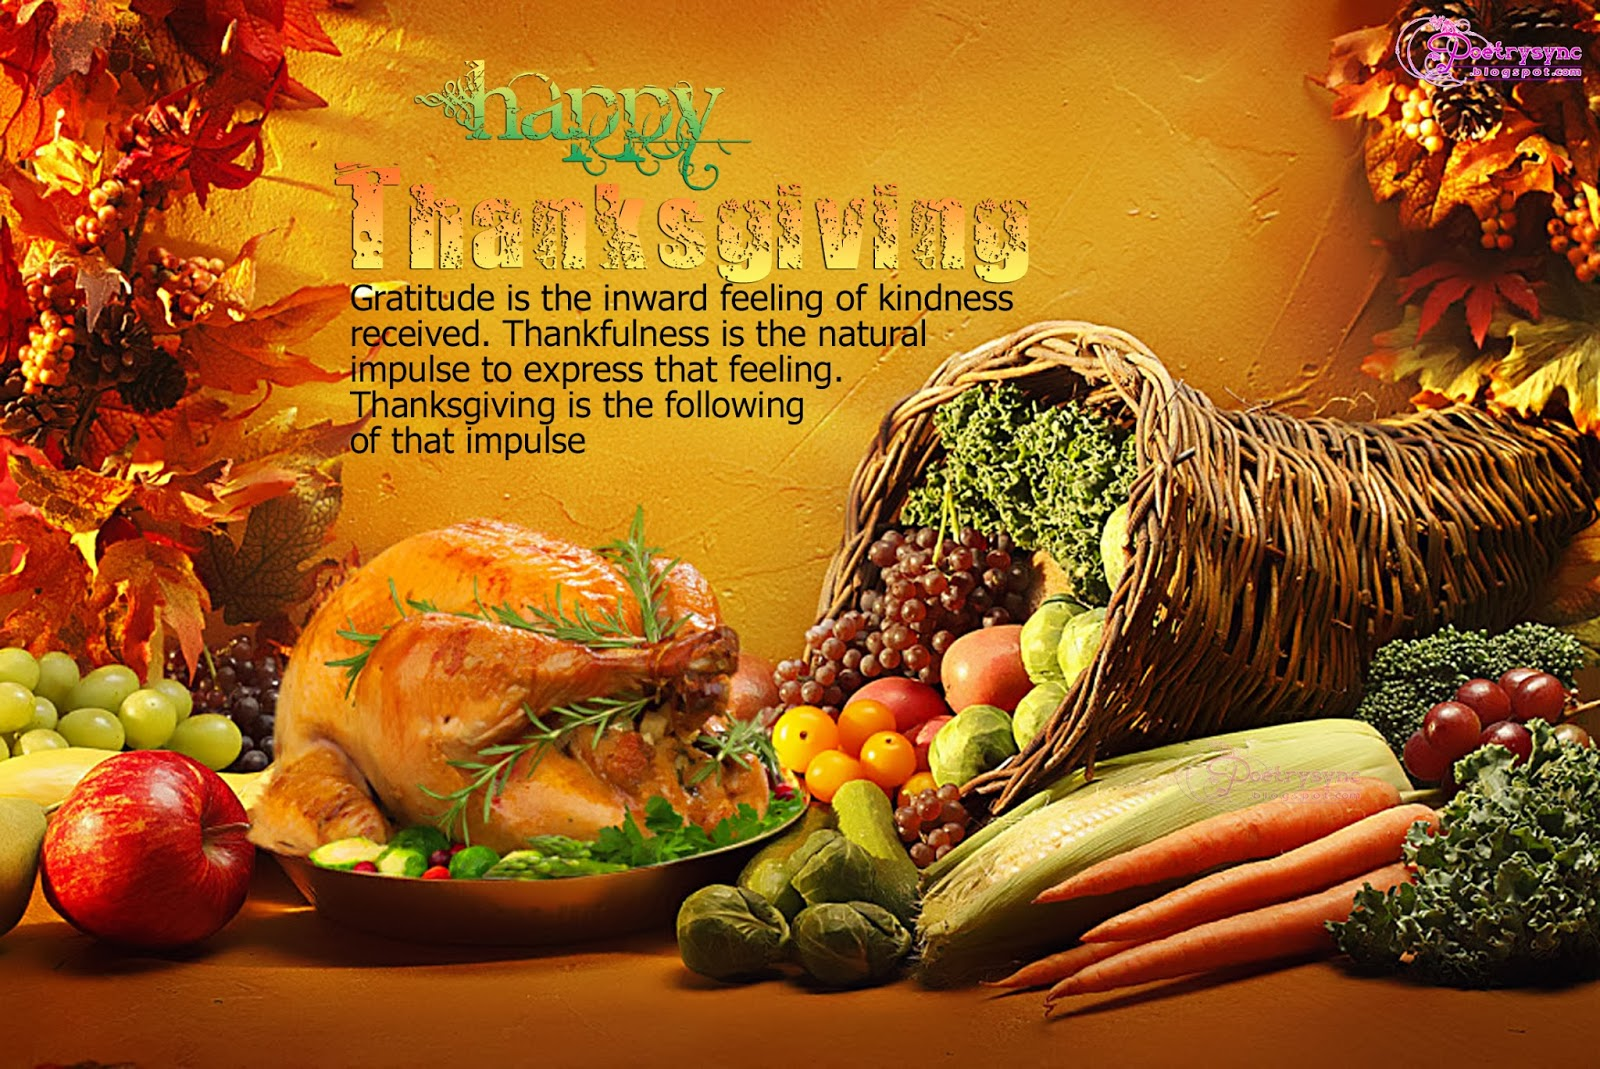 Thanksgiving Day Pictures 34 Thanksgiving Day Pictures 1600x1069